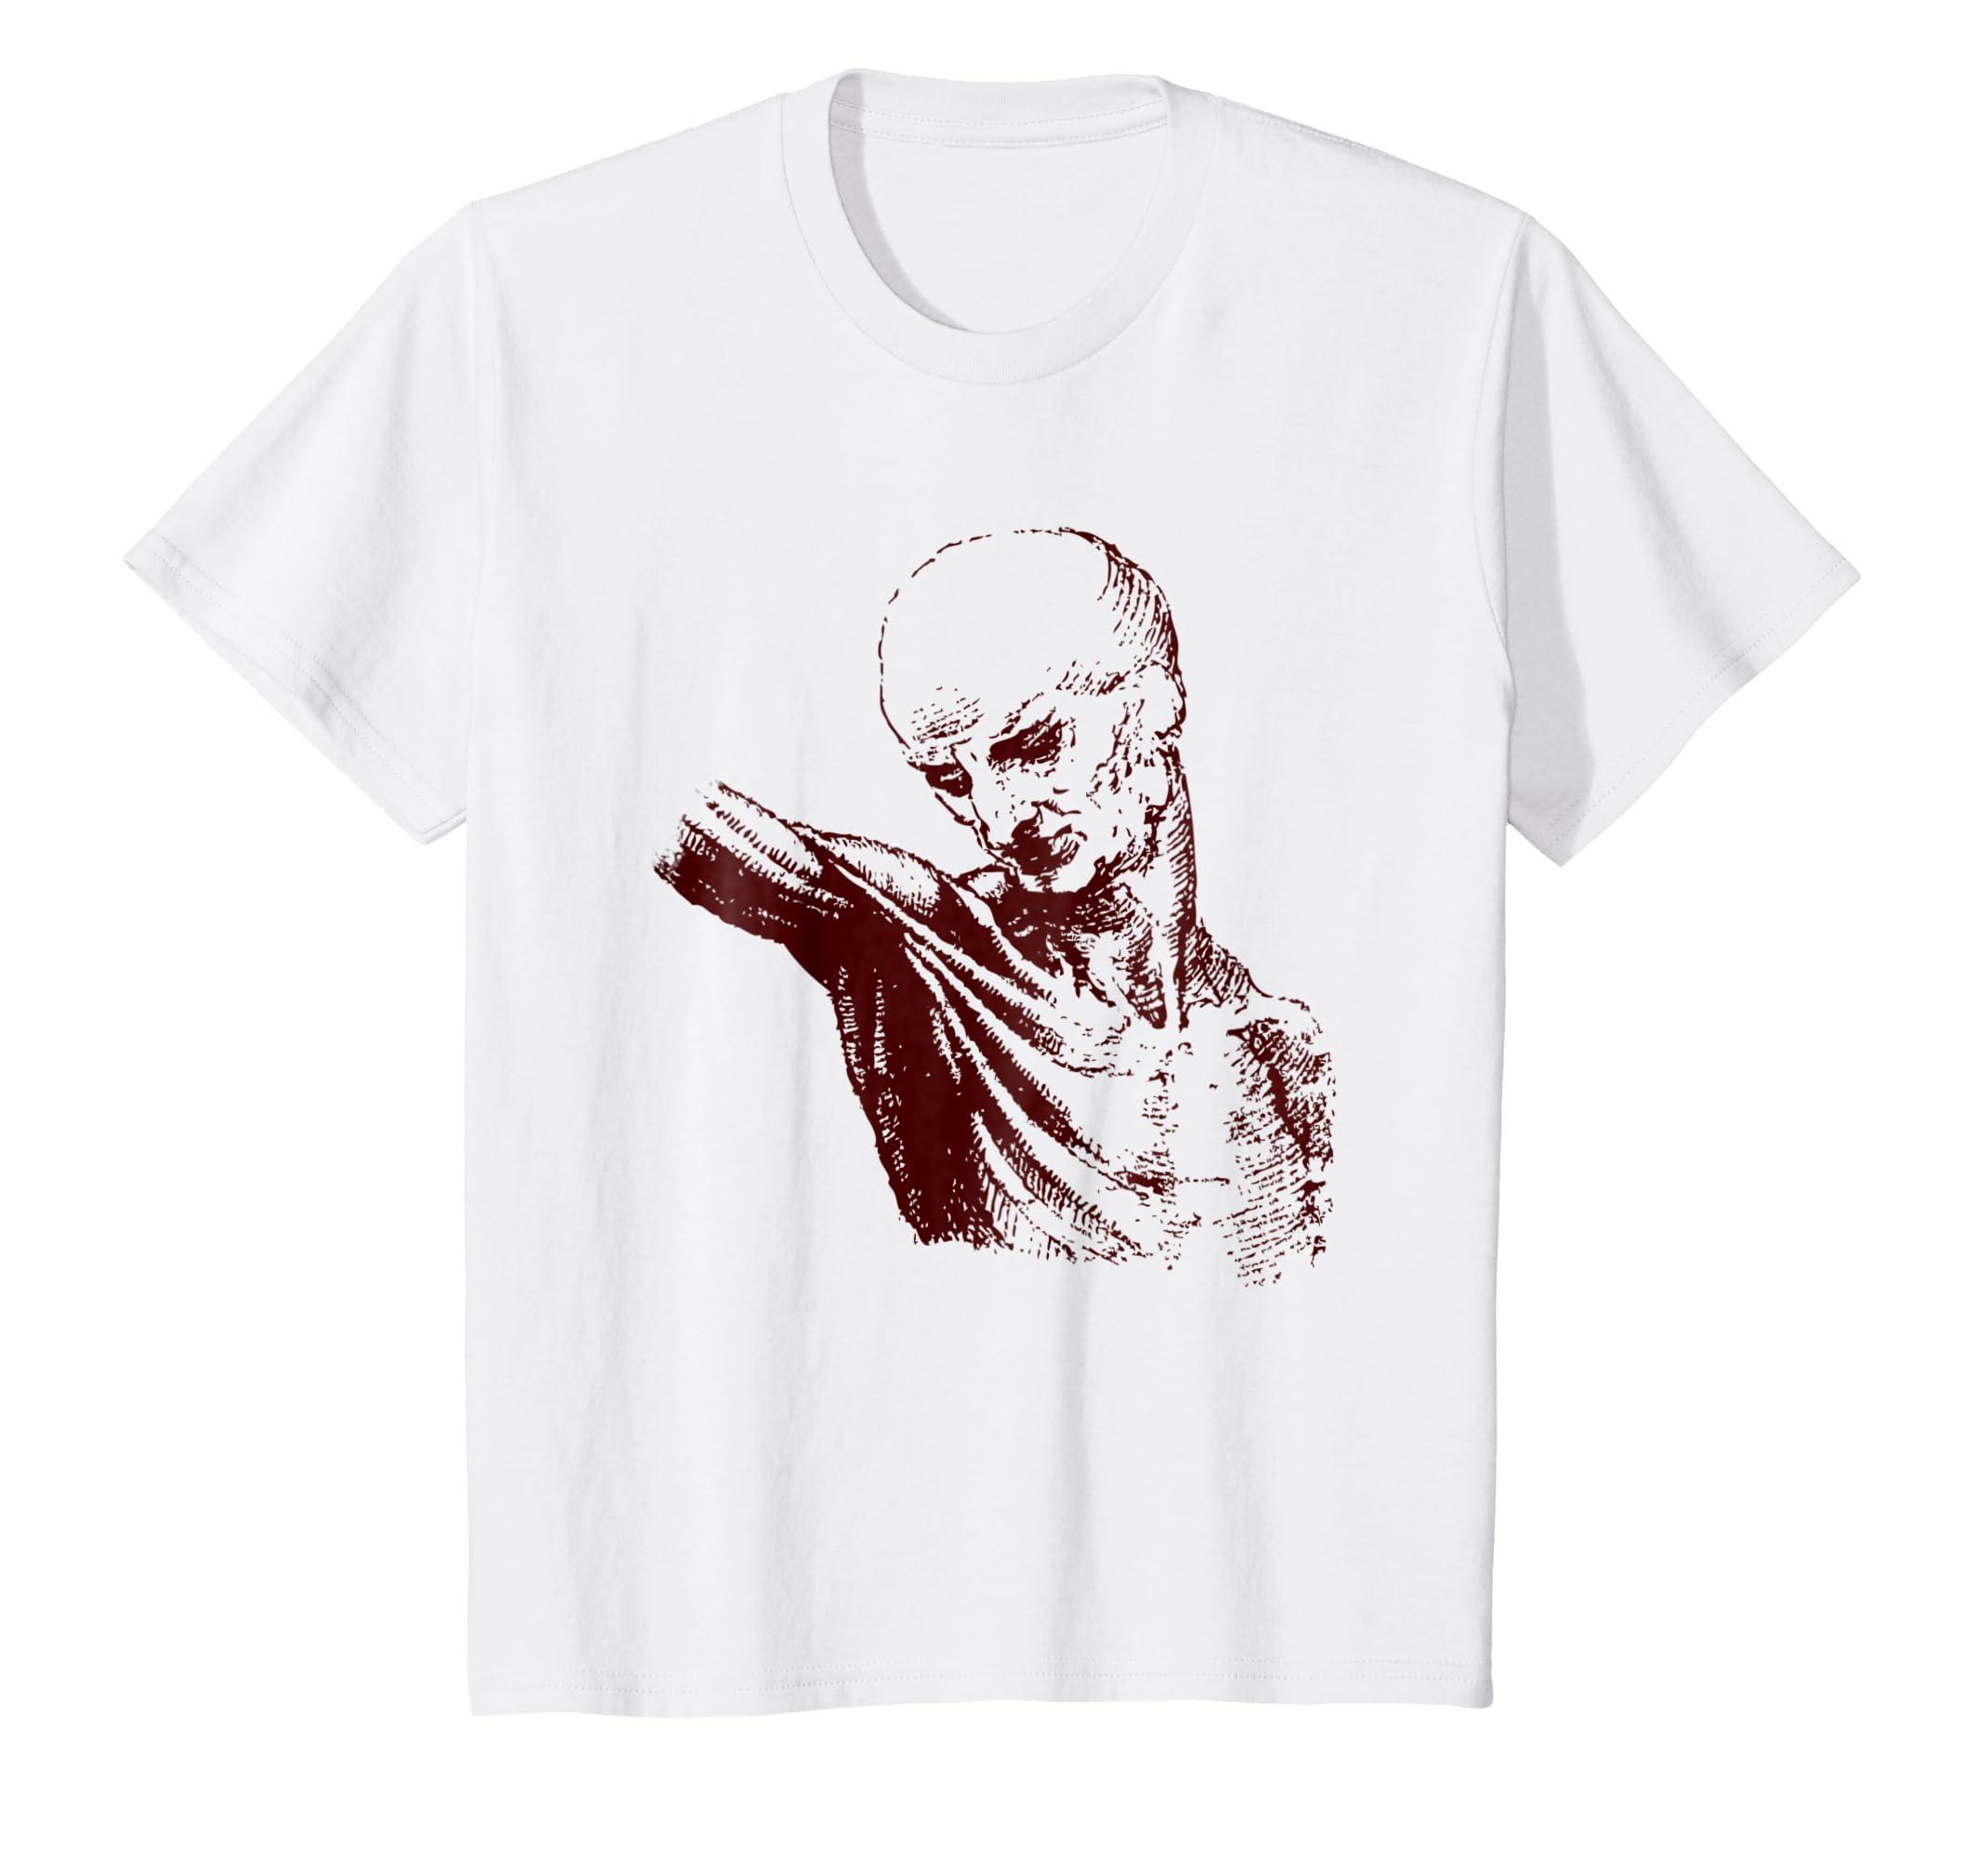 Amazon Leonardo Art T Shirt Da Vinci Sketch Human Anatomy Tee